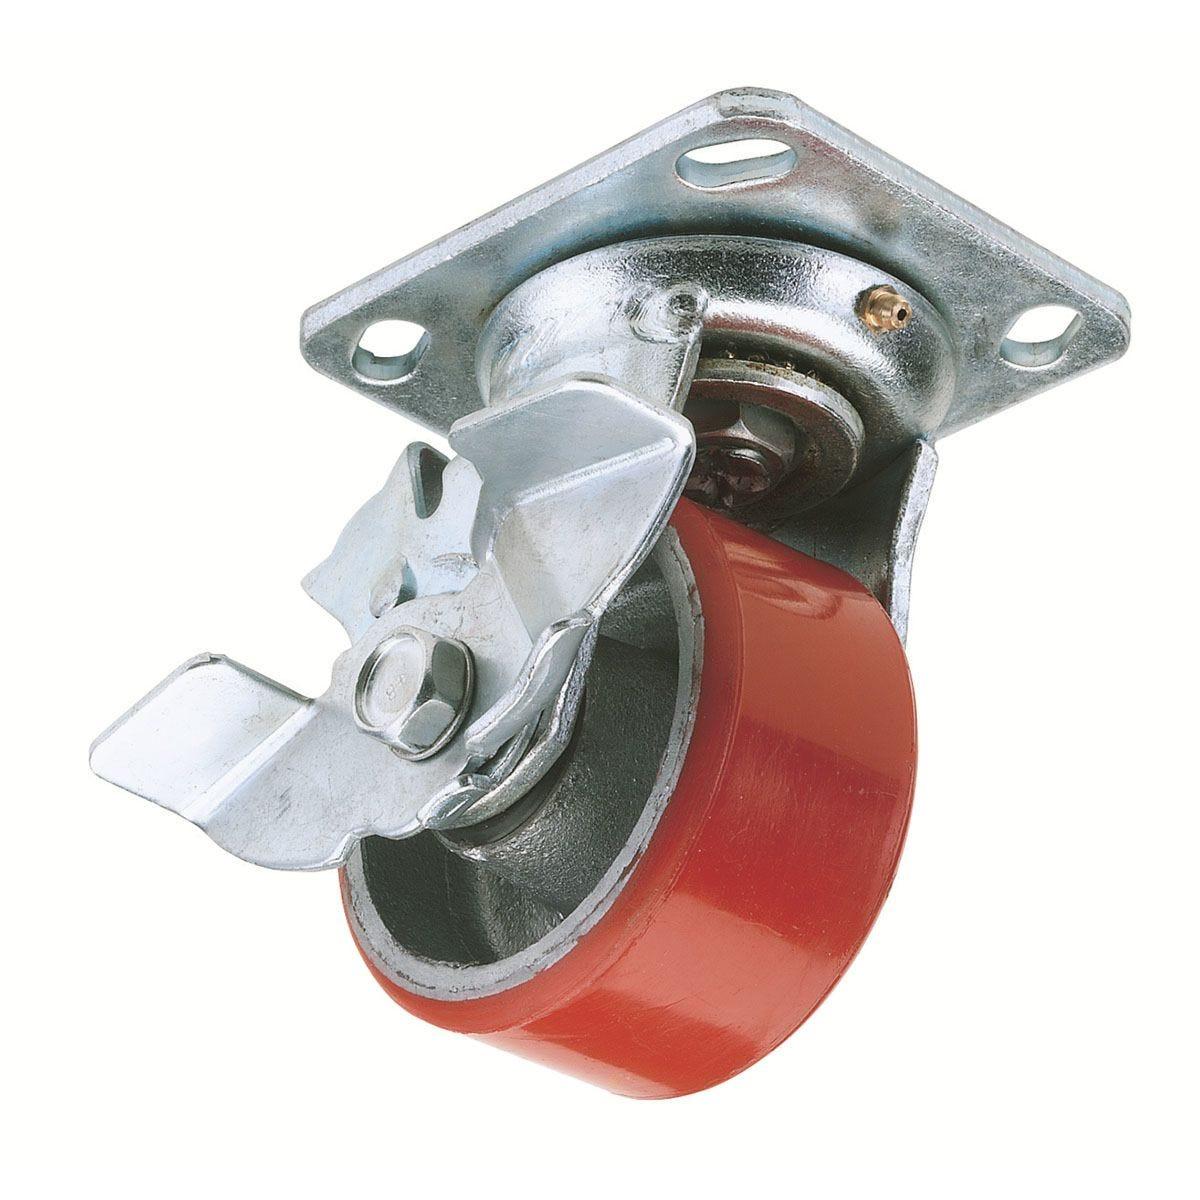 Draper 160mm Diameter Swivel Plate Fi x Ing Heavy Duty Polyurethane Wheel with Brake - S.W.L. 400Kg